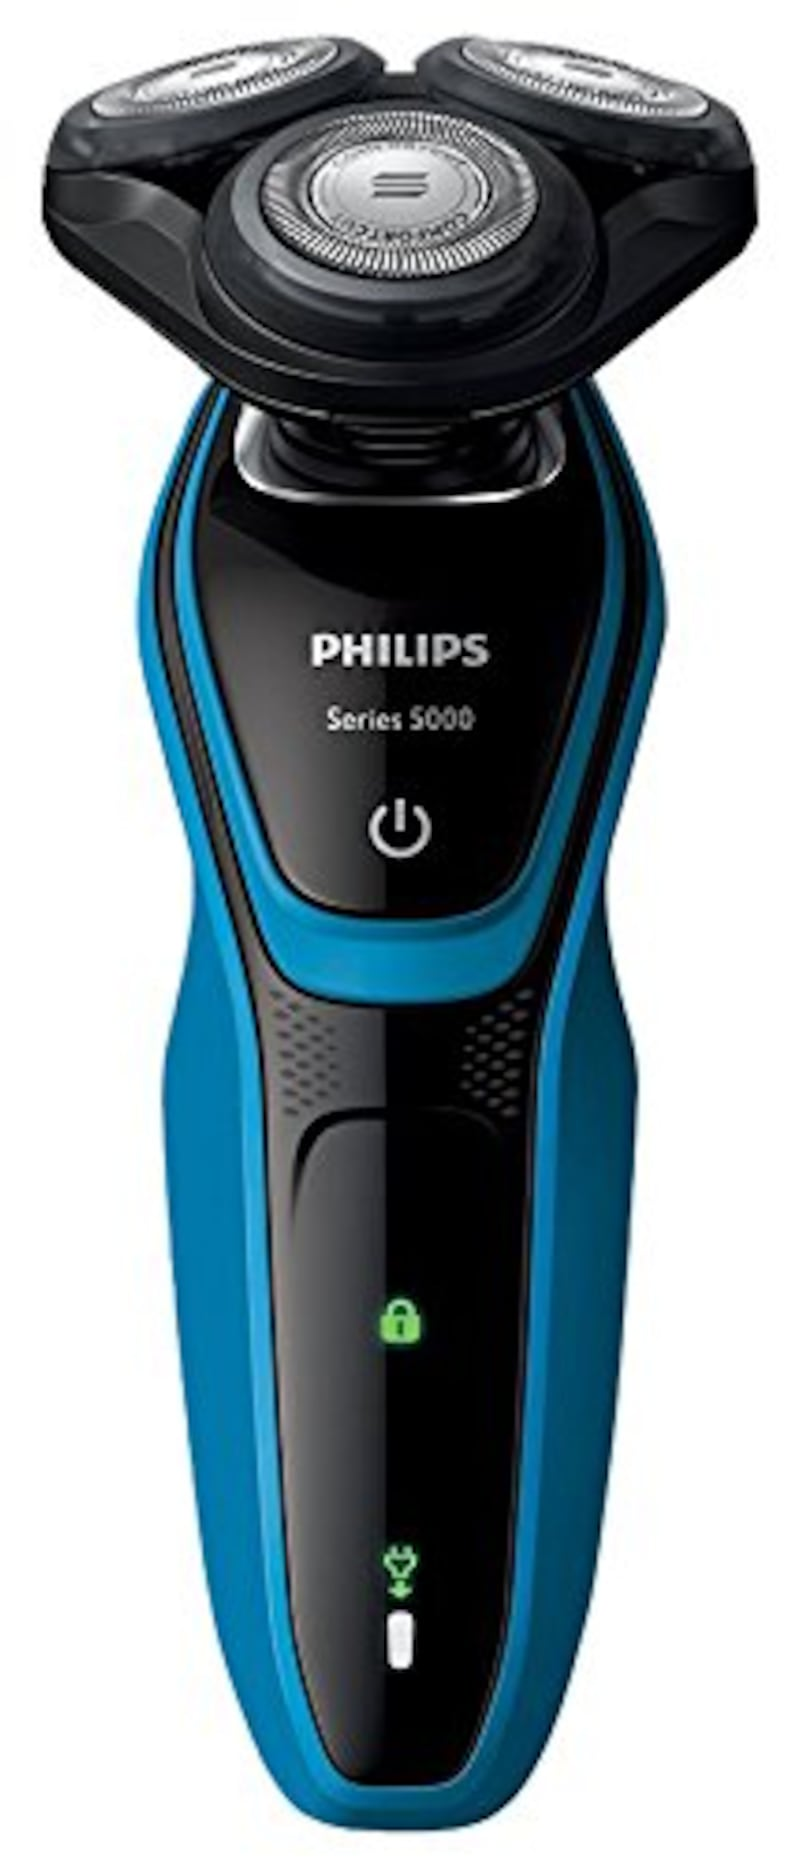 Philips(フィリップス),5000シリーズ,S5050/05